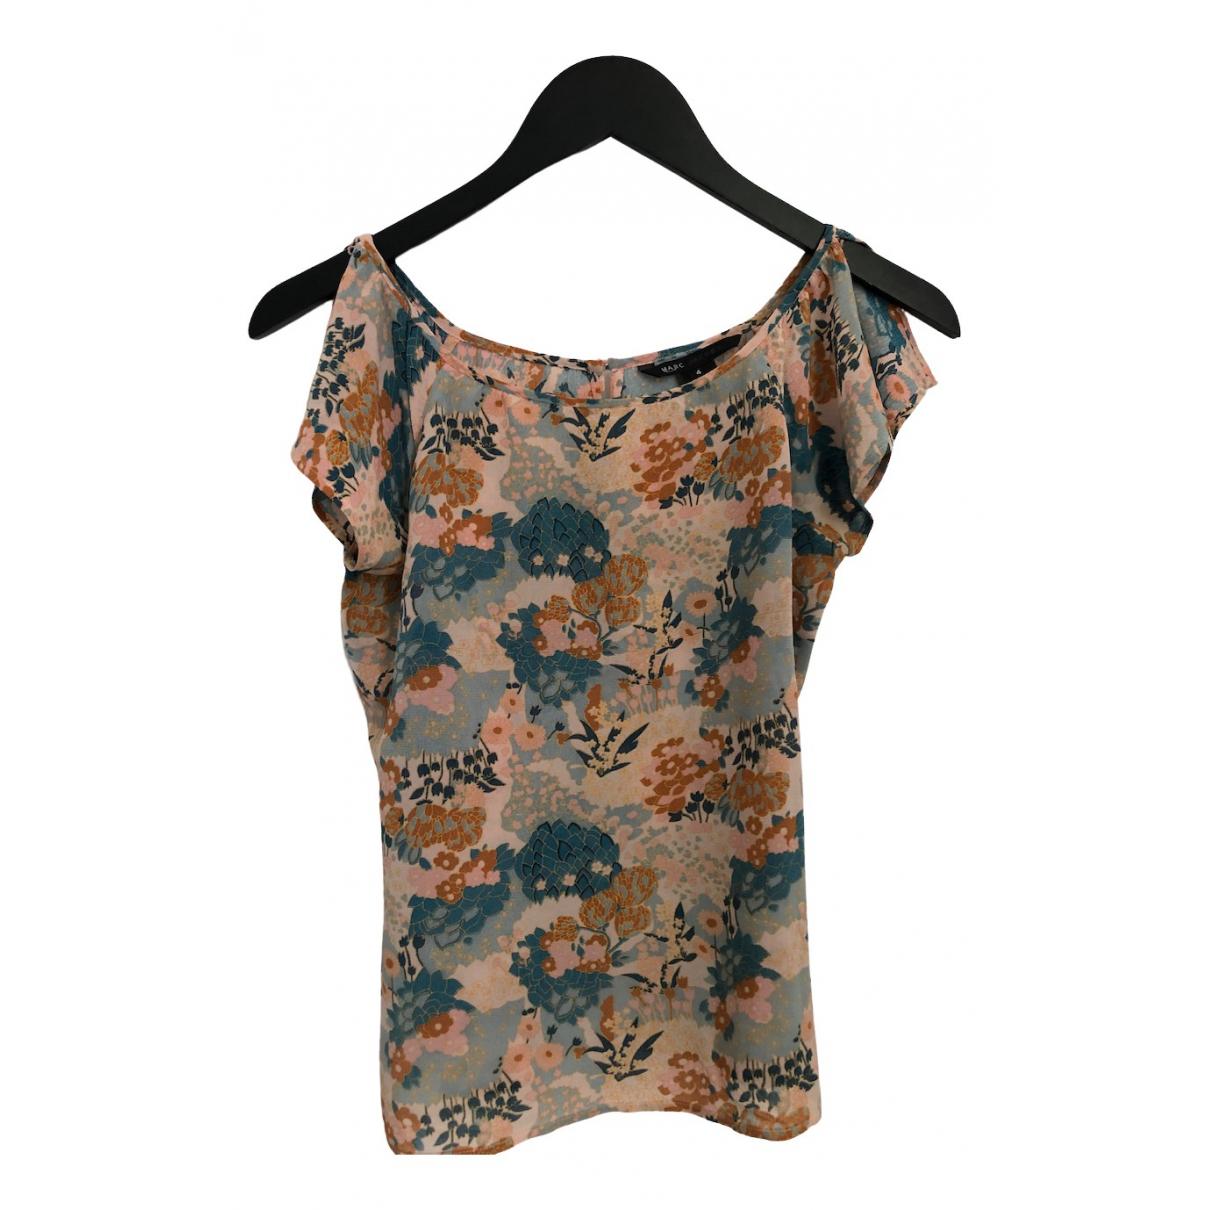 Marc Jacobs N Multicolour Silk  top for Women 4 US